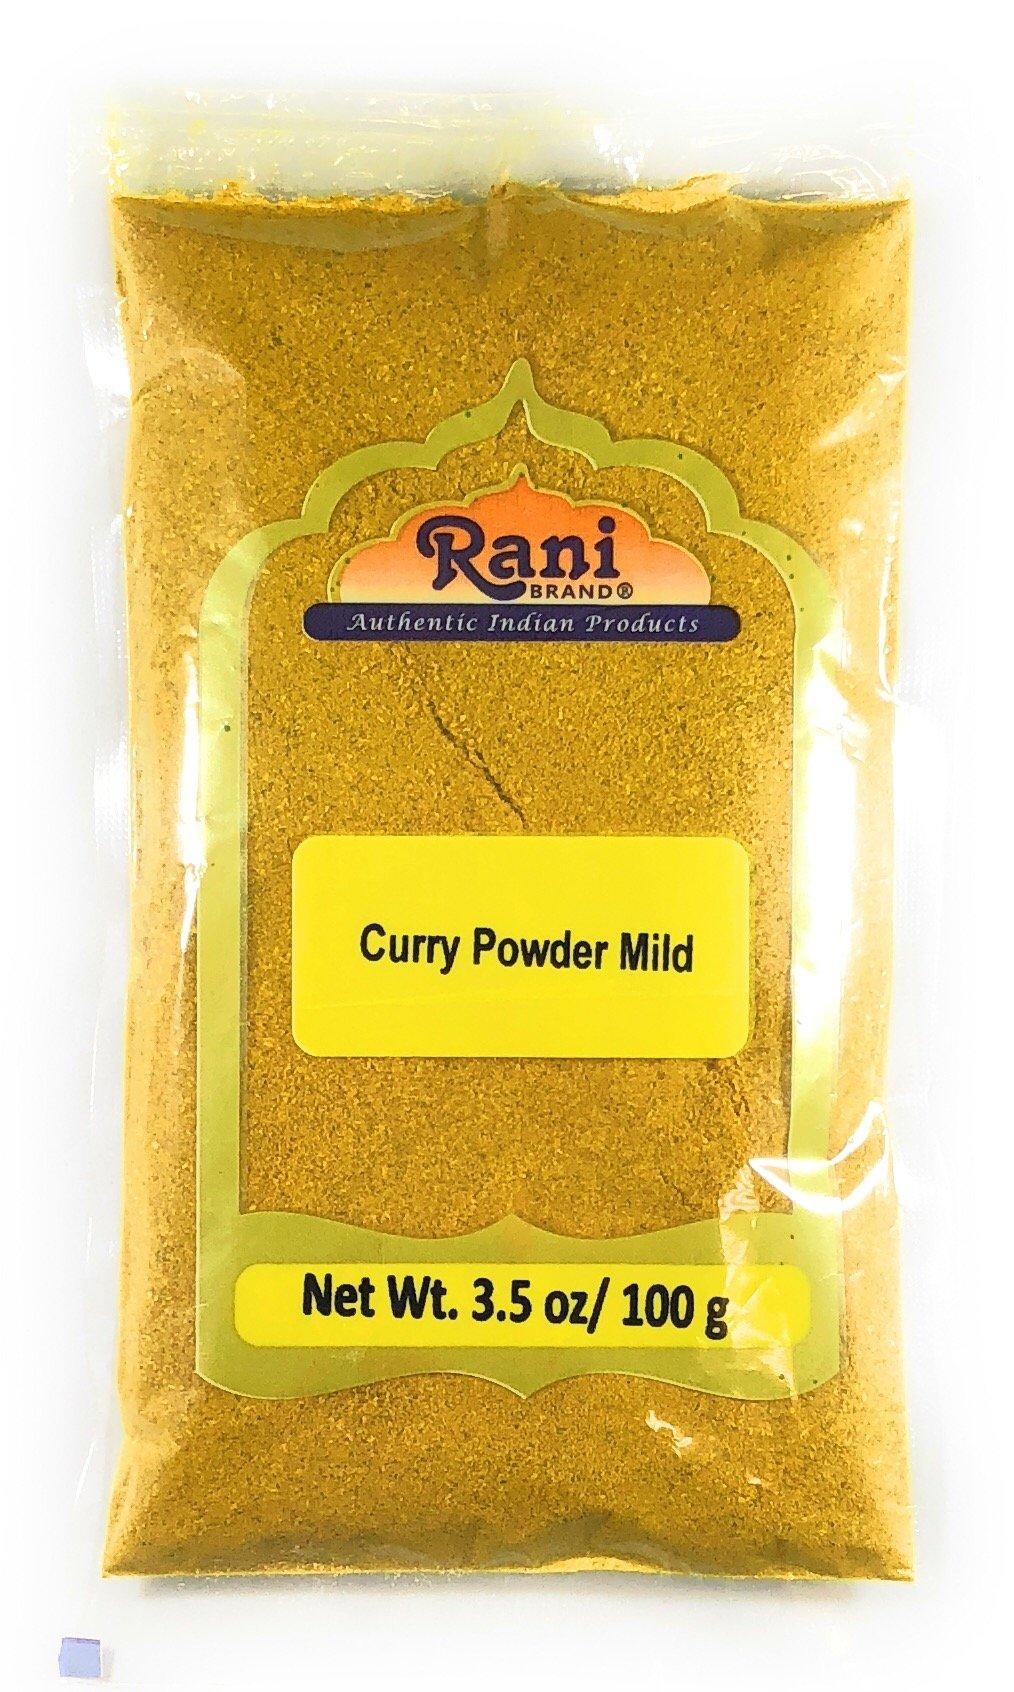 Rani Curry Powder Mild Natural 10-Spice Blend 100g (3.5oz) ~ Salt Free | Vegan | Gluten Free Ingredients | NON-GMO